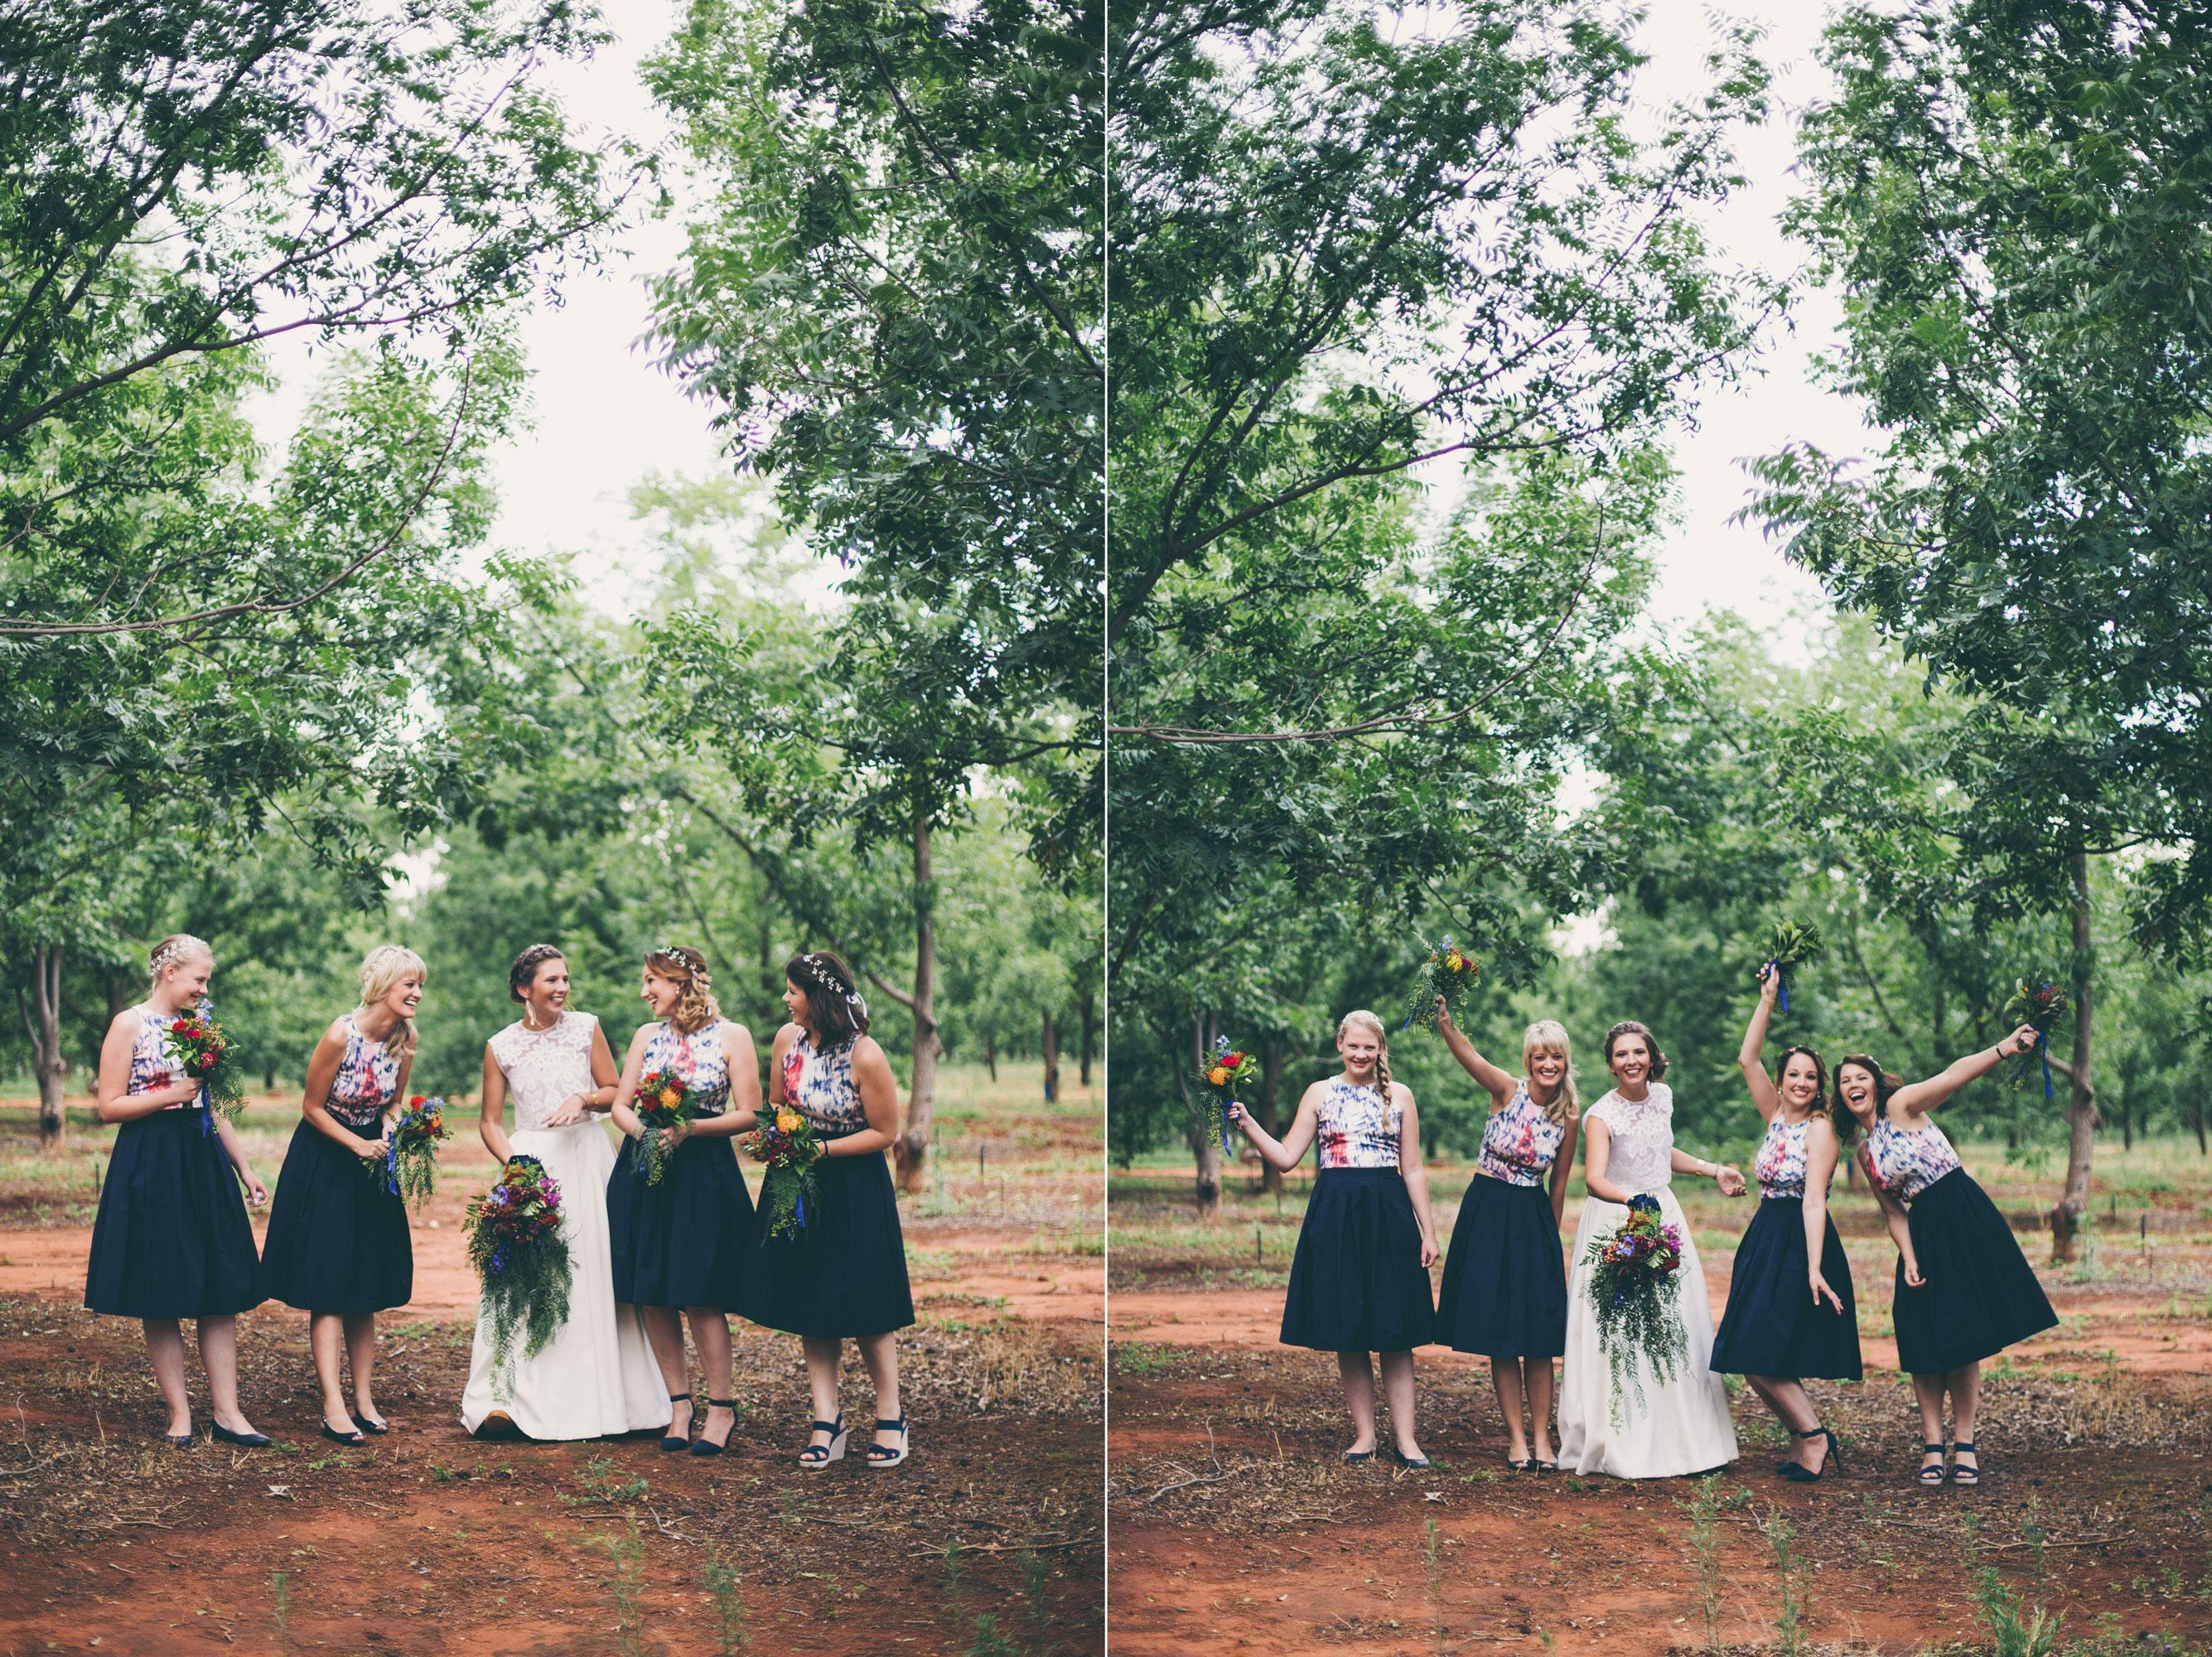 The Nutcracker_Wedding Photography_Maryke Albertyn 32